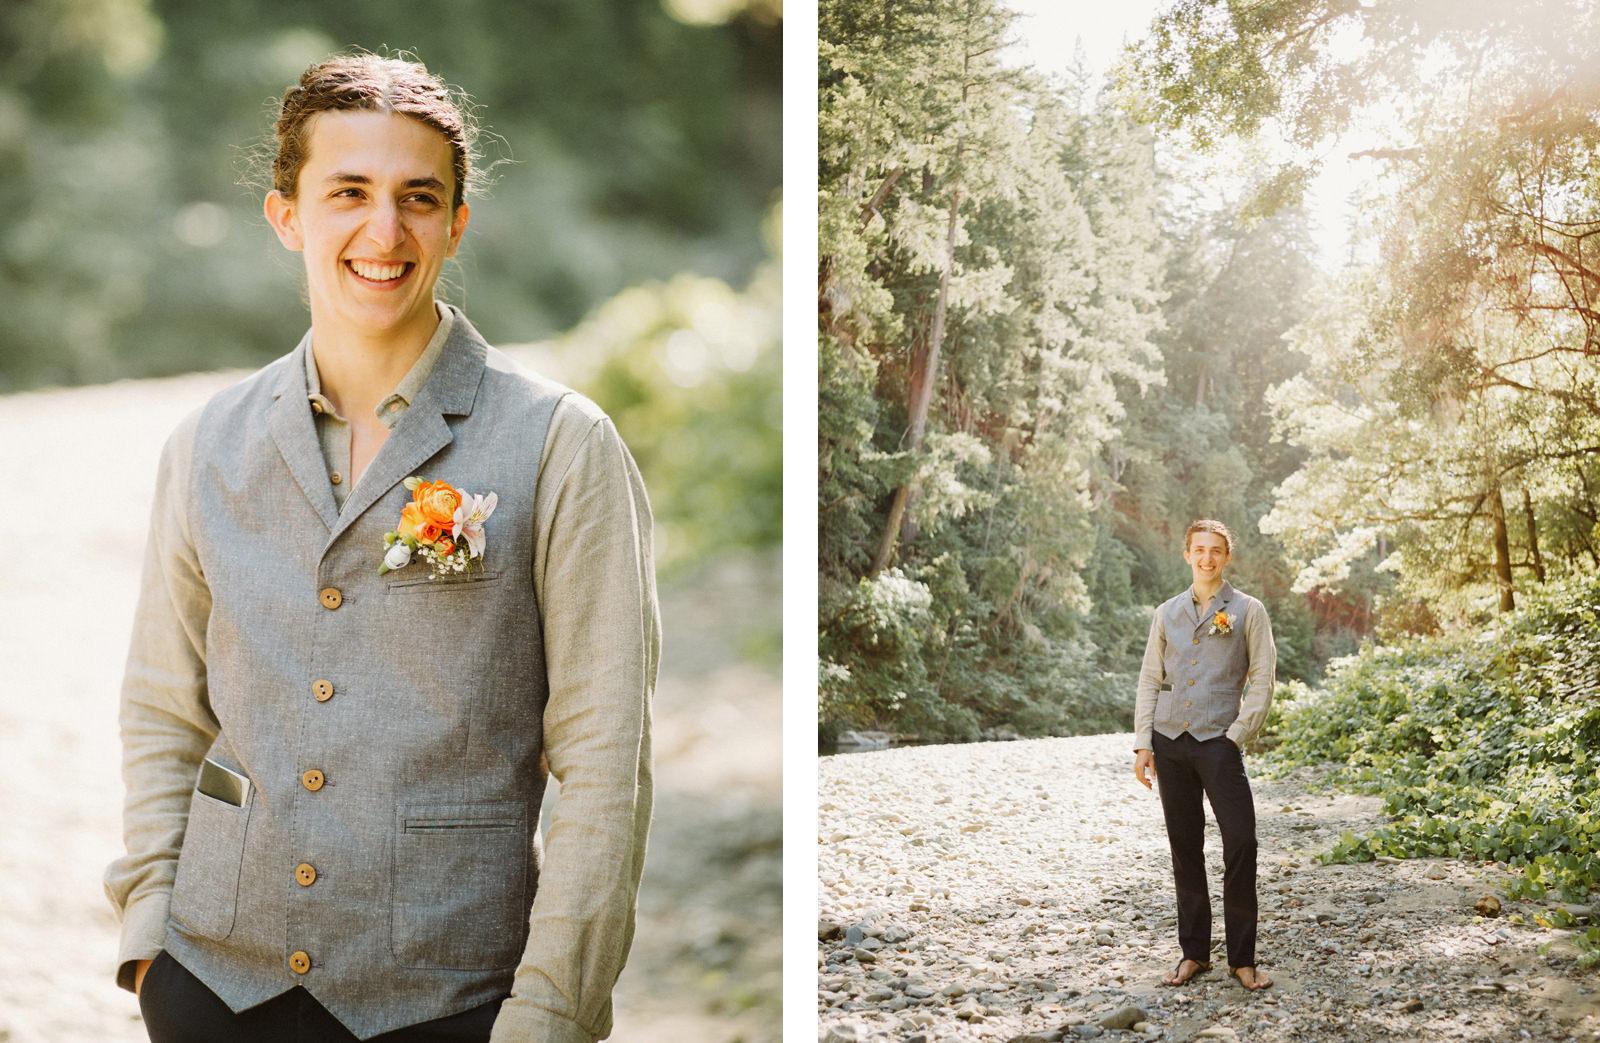 rivers-bend-retreat-wedding-053 RIVER'S BEND RETREAT WEDDING